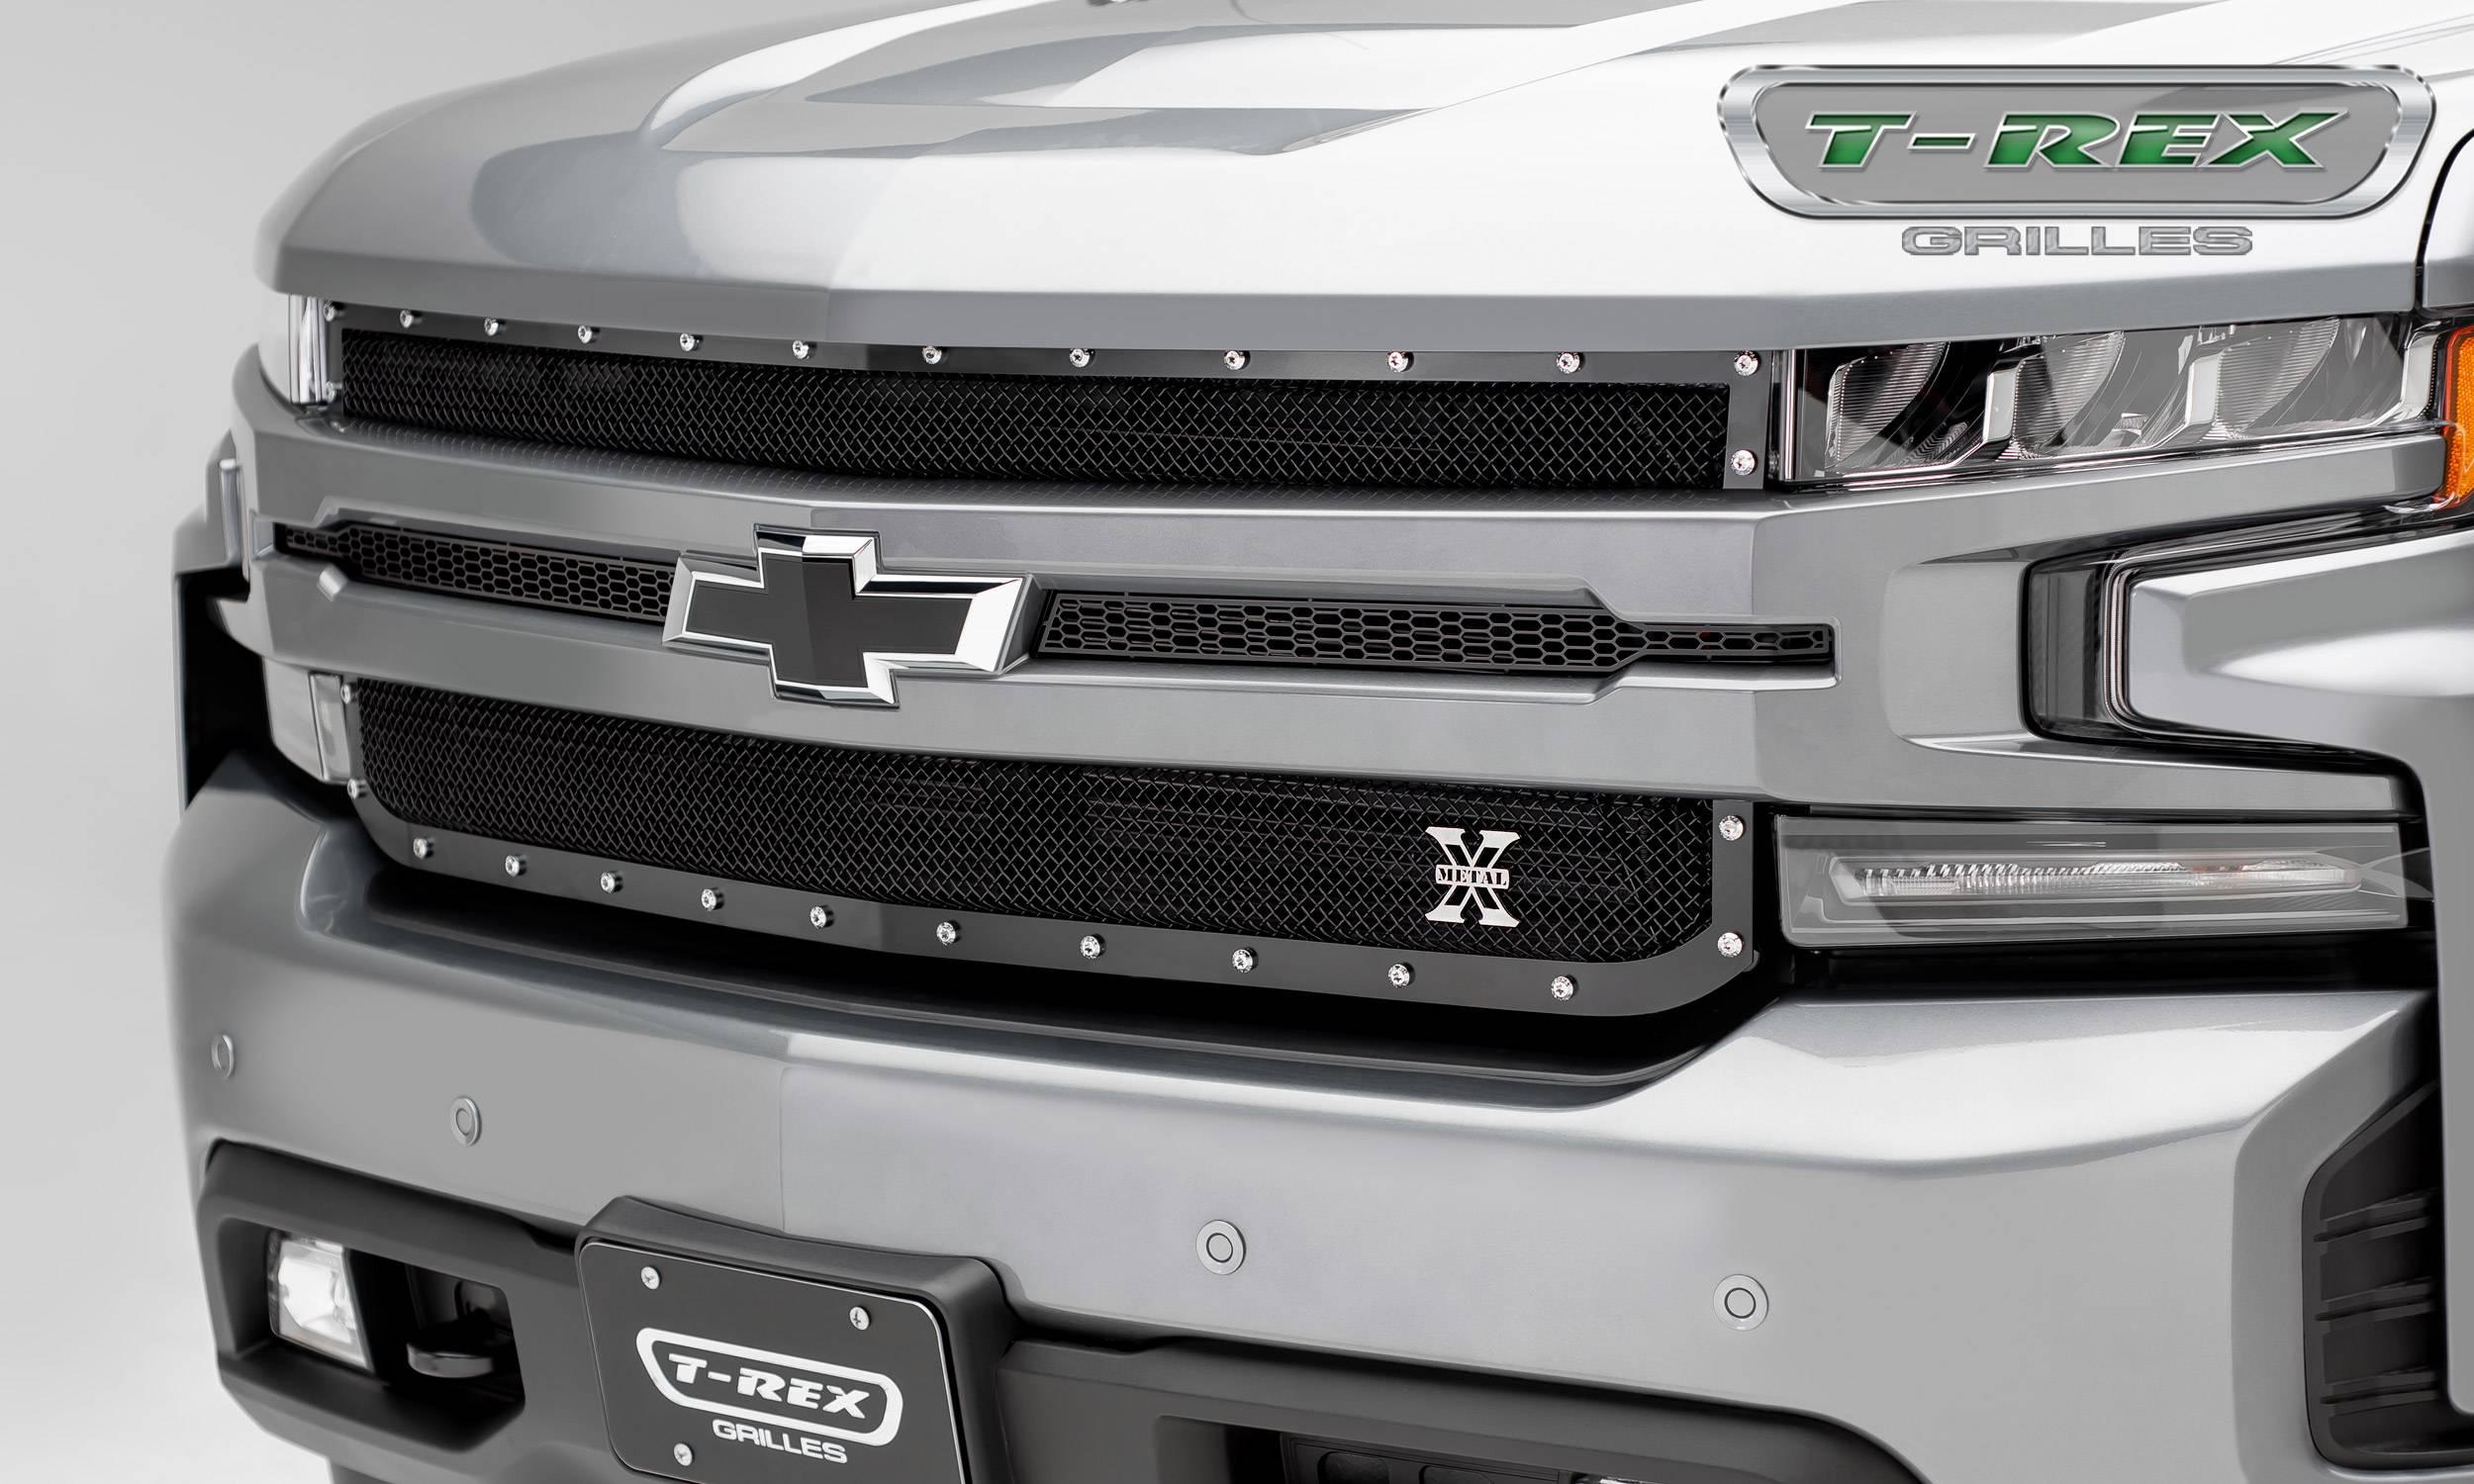 T-REX Grilles - 2019 Silverado 1500 X-Metal Grille, Black, 1 Pc, Replacement, Chrome Studs - PN #6711261